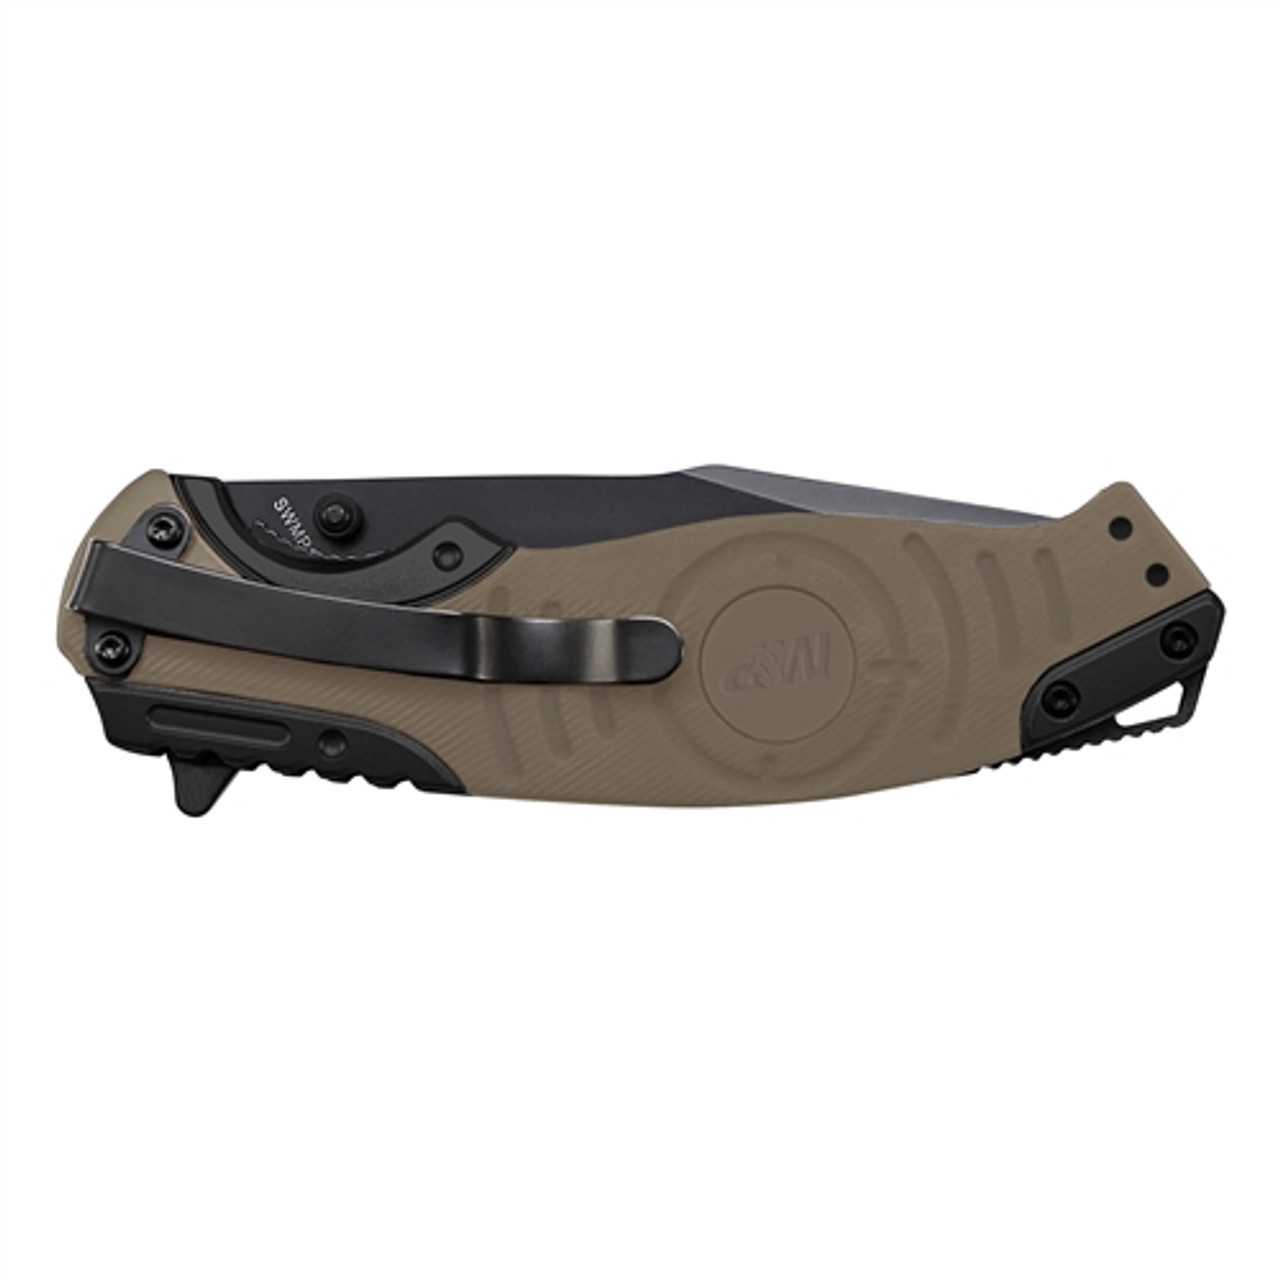 Smith & Wesson M&P SWMP13GLS Tan/Black Folder Knife, Black Combo Blade